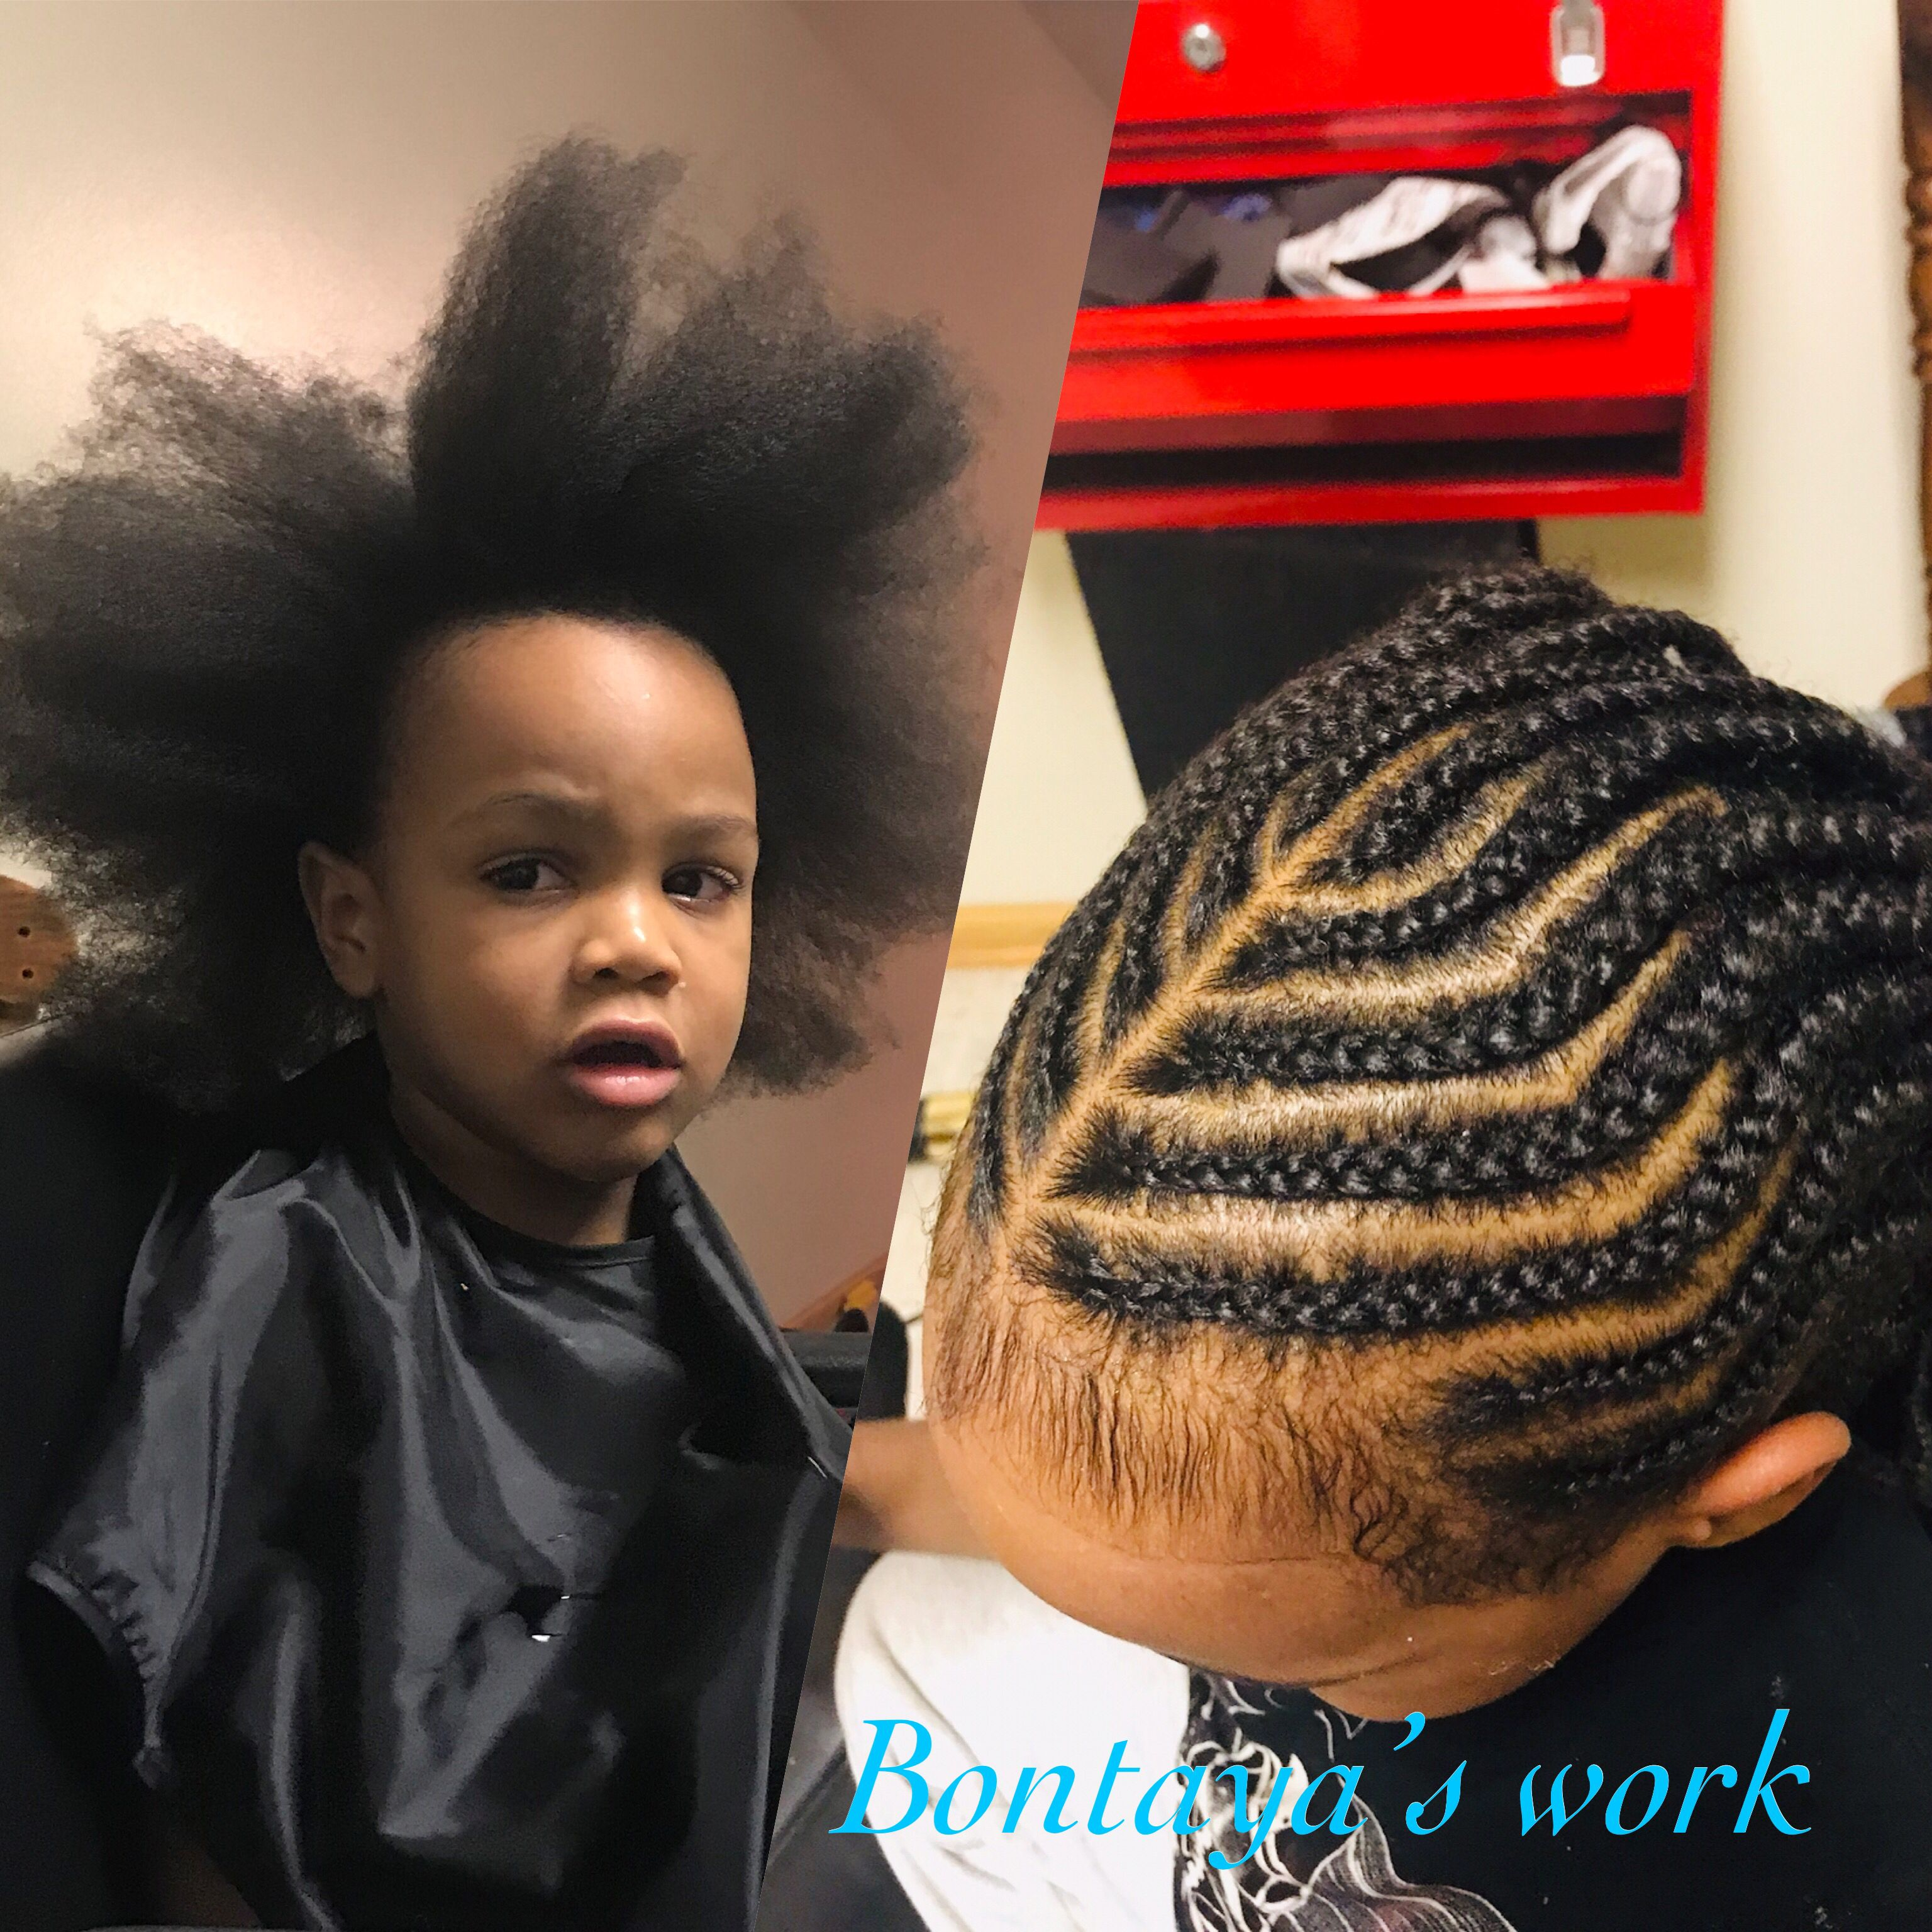 Boystyles Babyboy Styleforboys Naturalhair Longhair Braids Boysbraids Son Braids For Boys Boy Hairstyles Kids Hairstyles